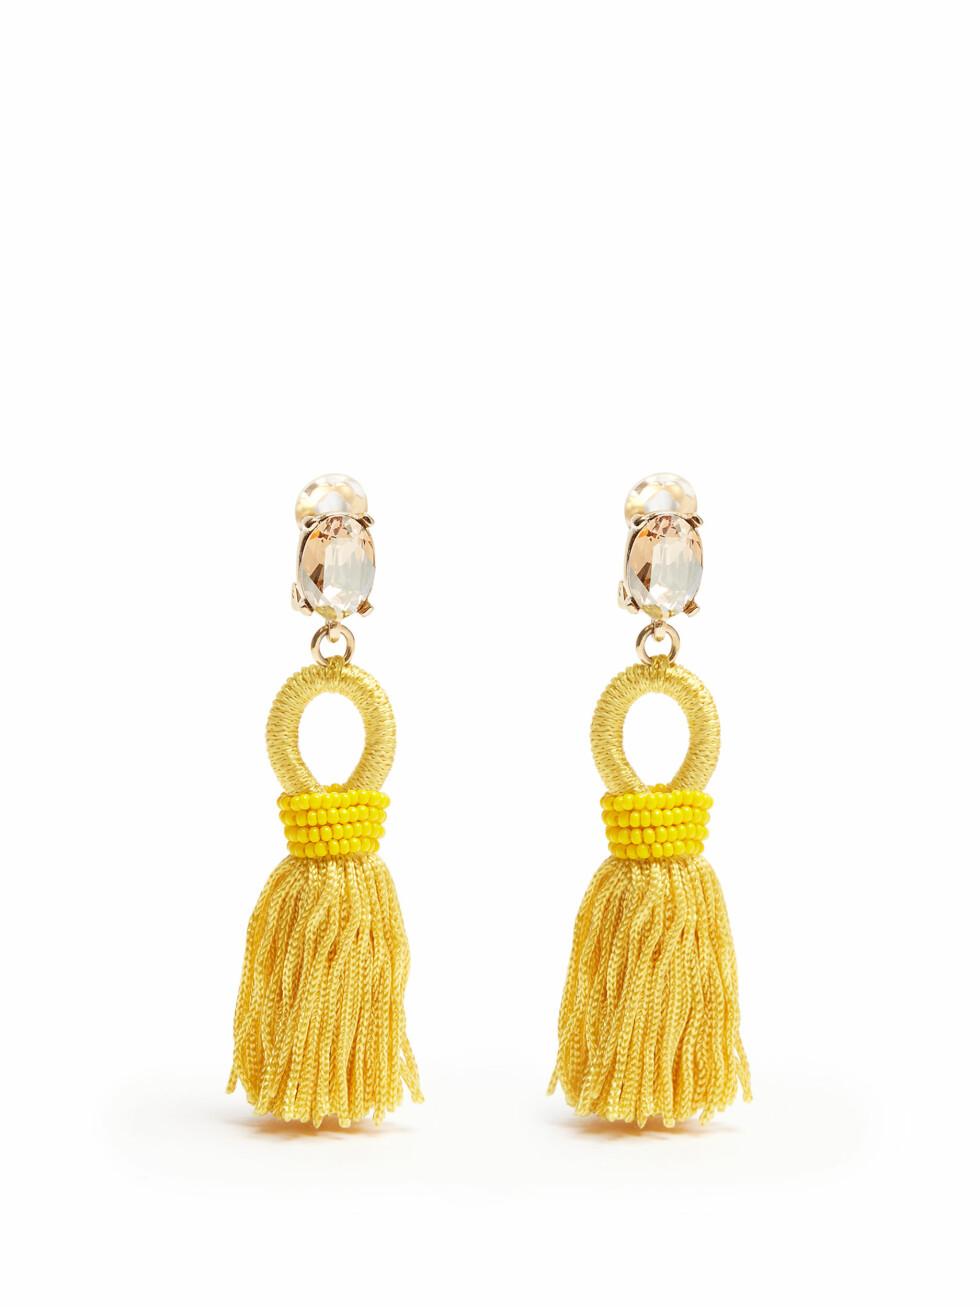 Øredobber fra Oscar de la Renta via Matchesfashion.com | kr 2915 | http://www.matchesfashion.com/intl/products/Oscar-De-La-Renta-Short-tassel-drop-clip-on-earrings--1078367